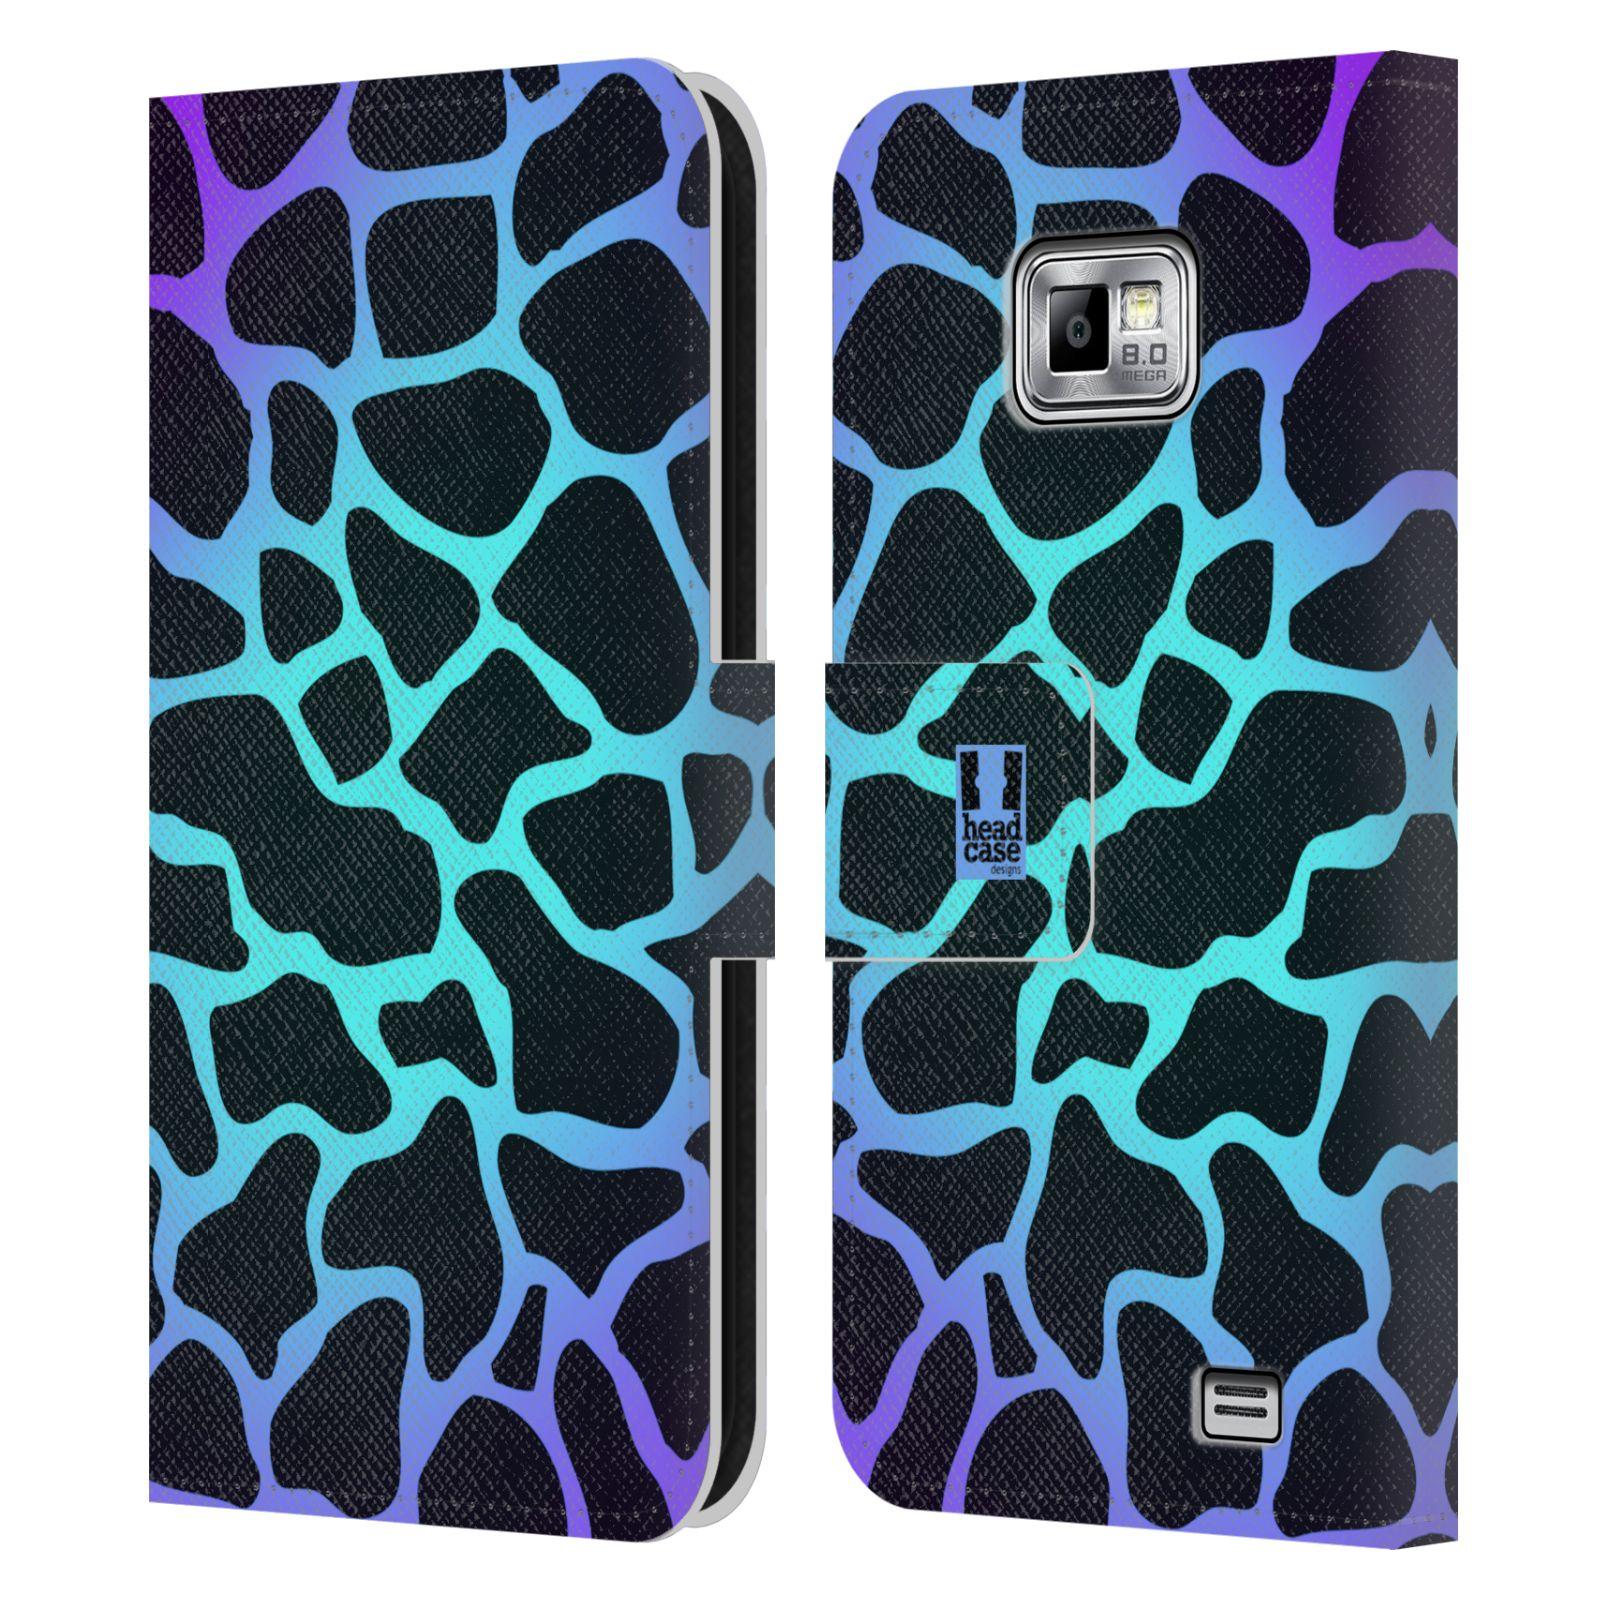 HEAD CASE Flipové pouzdro pro mobil Samsung Galaxy S2 i9100 Zvířecí barevné vzory magická tyrkysova žirafa